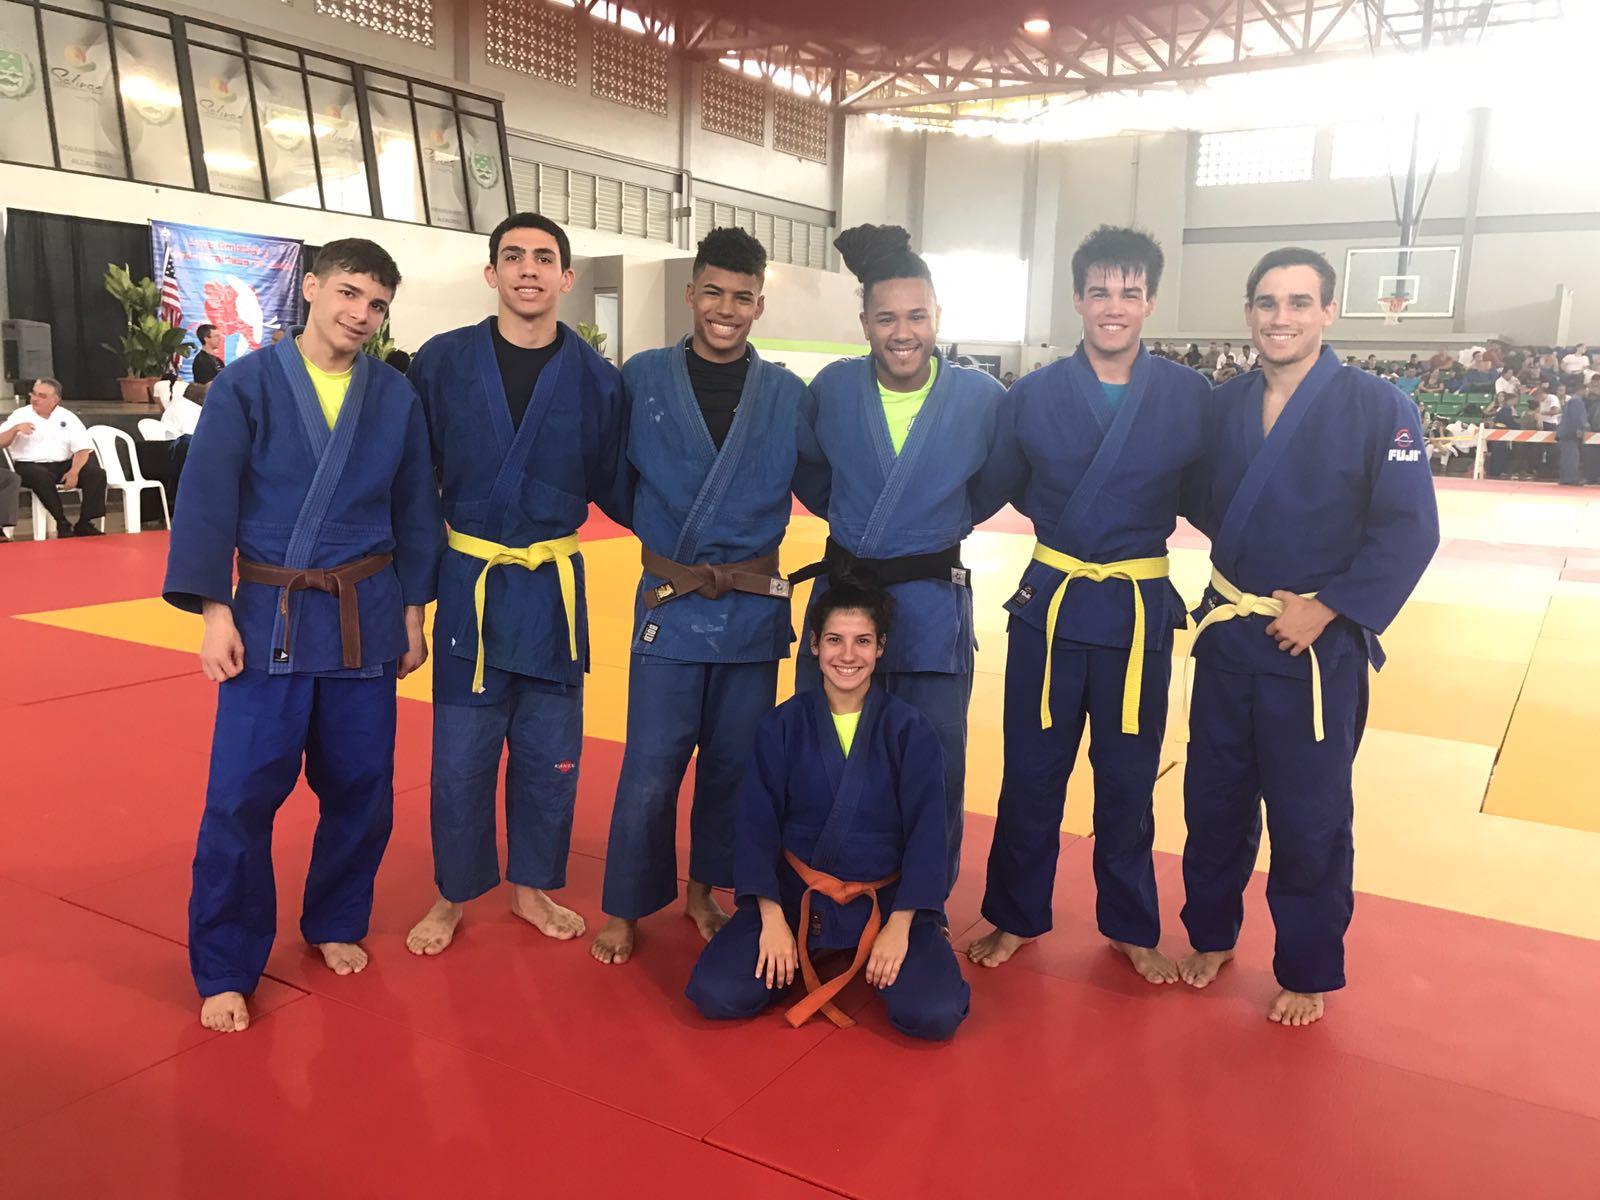 Equipo Bayamon - Chris Rosado, Carlos Mendez, Yavied Kulian, Henry Vidal, Ricardo Sevilla, Jean Carlo Rivera y Allizone Figueroa